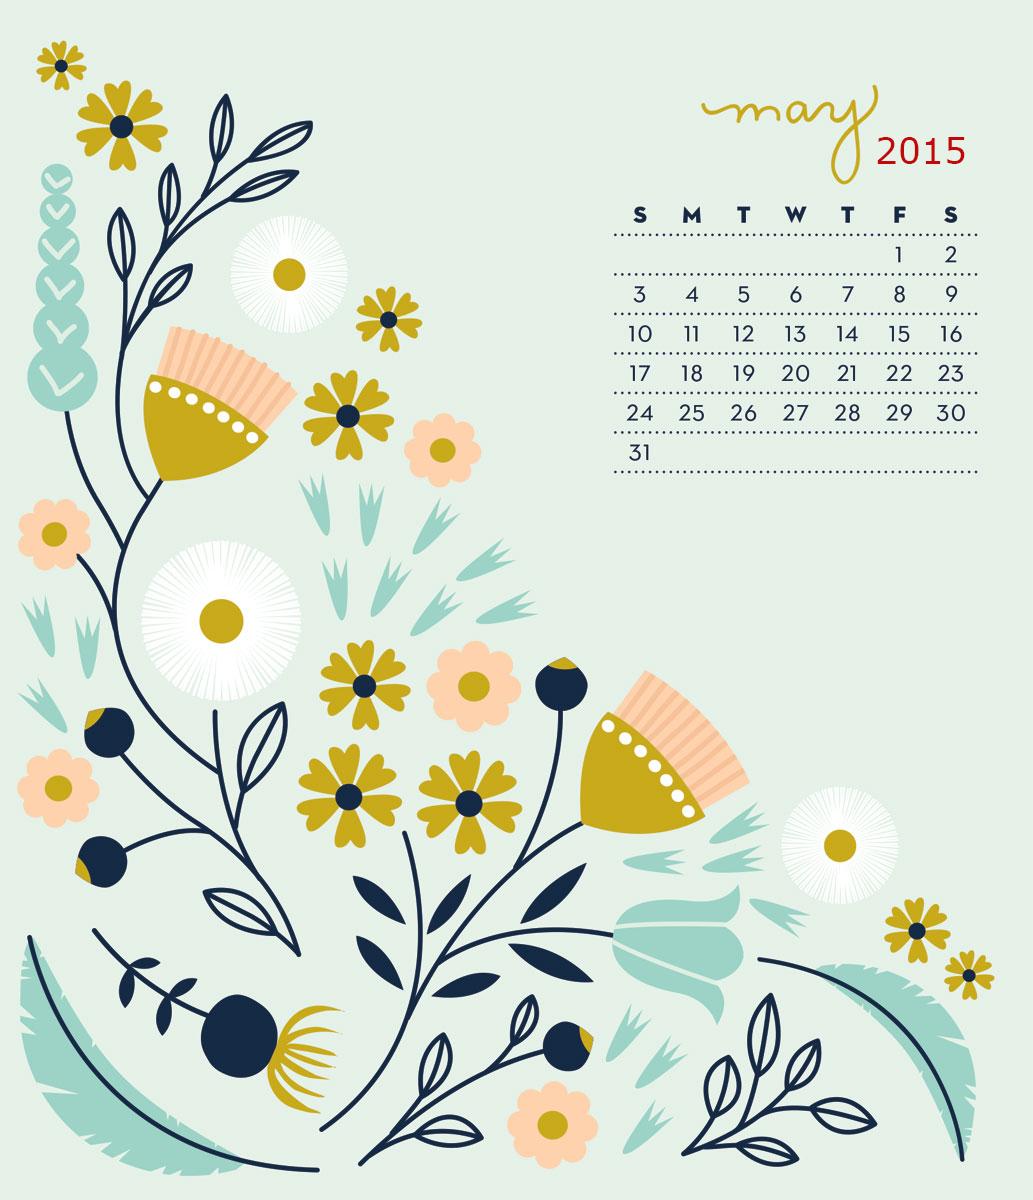 May 2015 Calendar Wallpapers HD Happy Holidays 2015 1033x1200